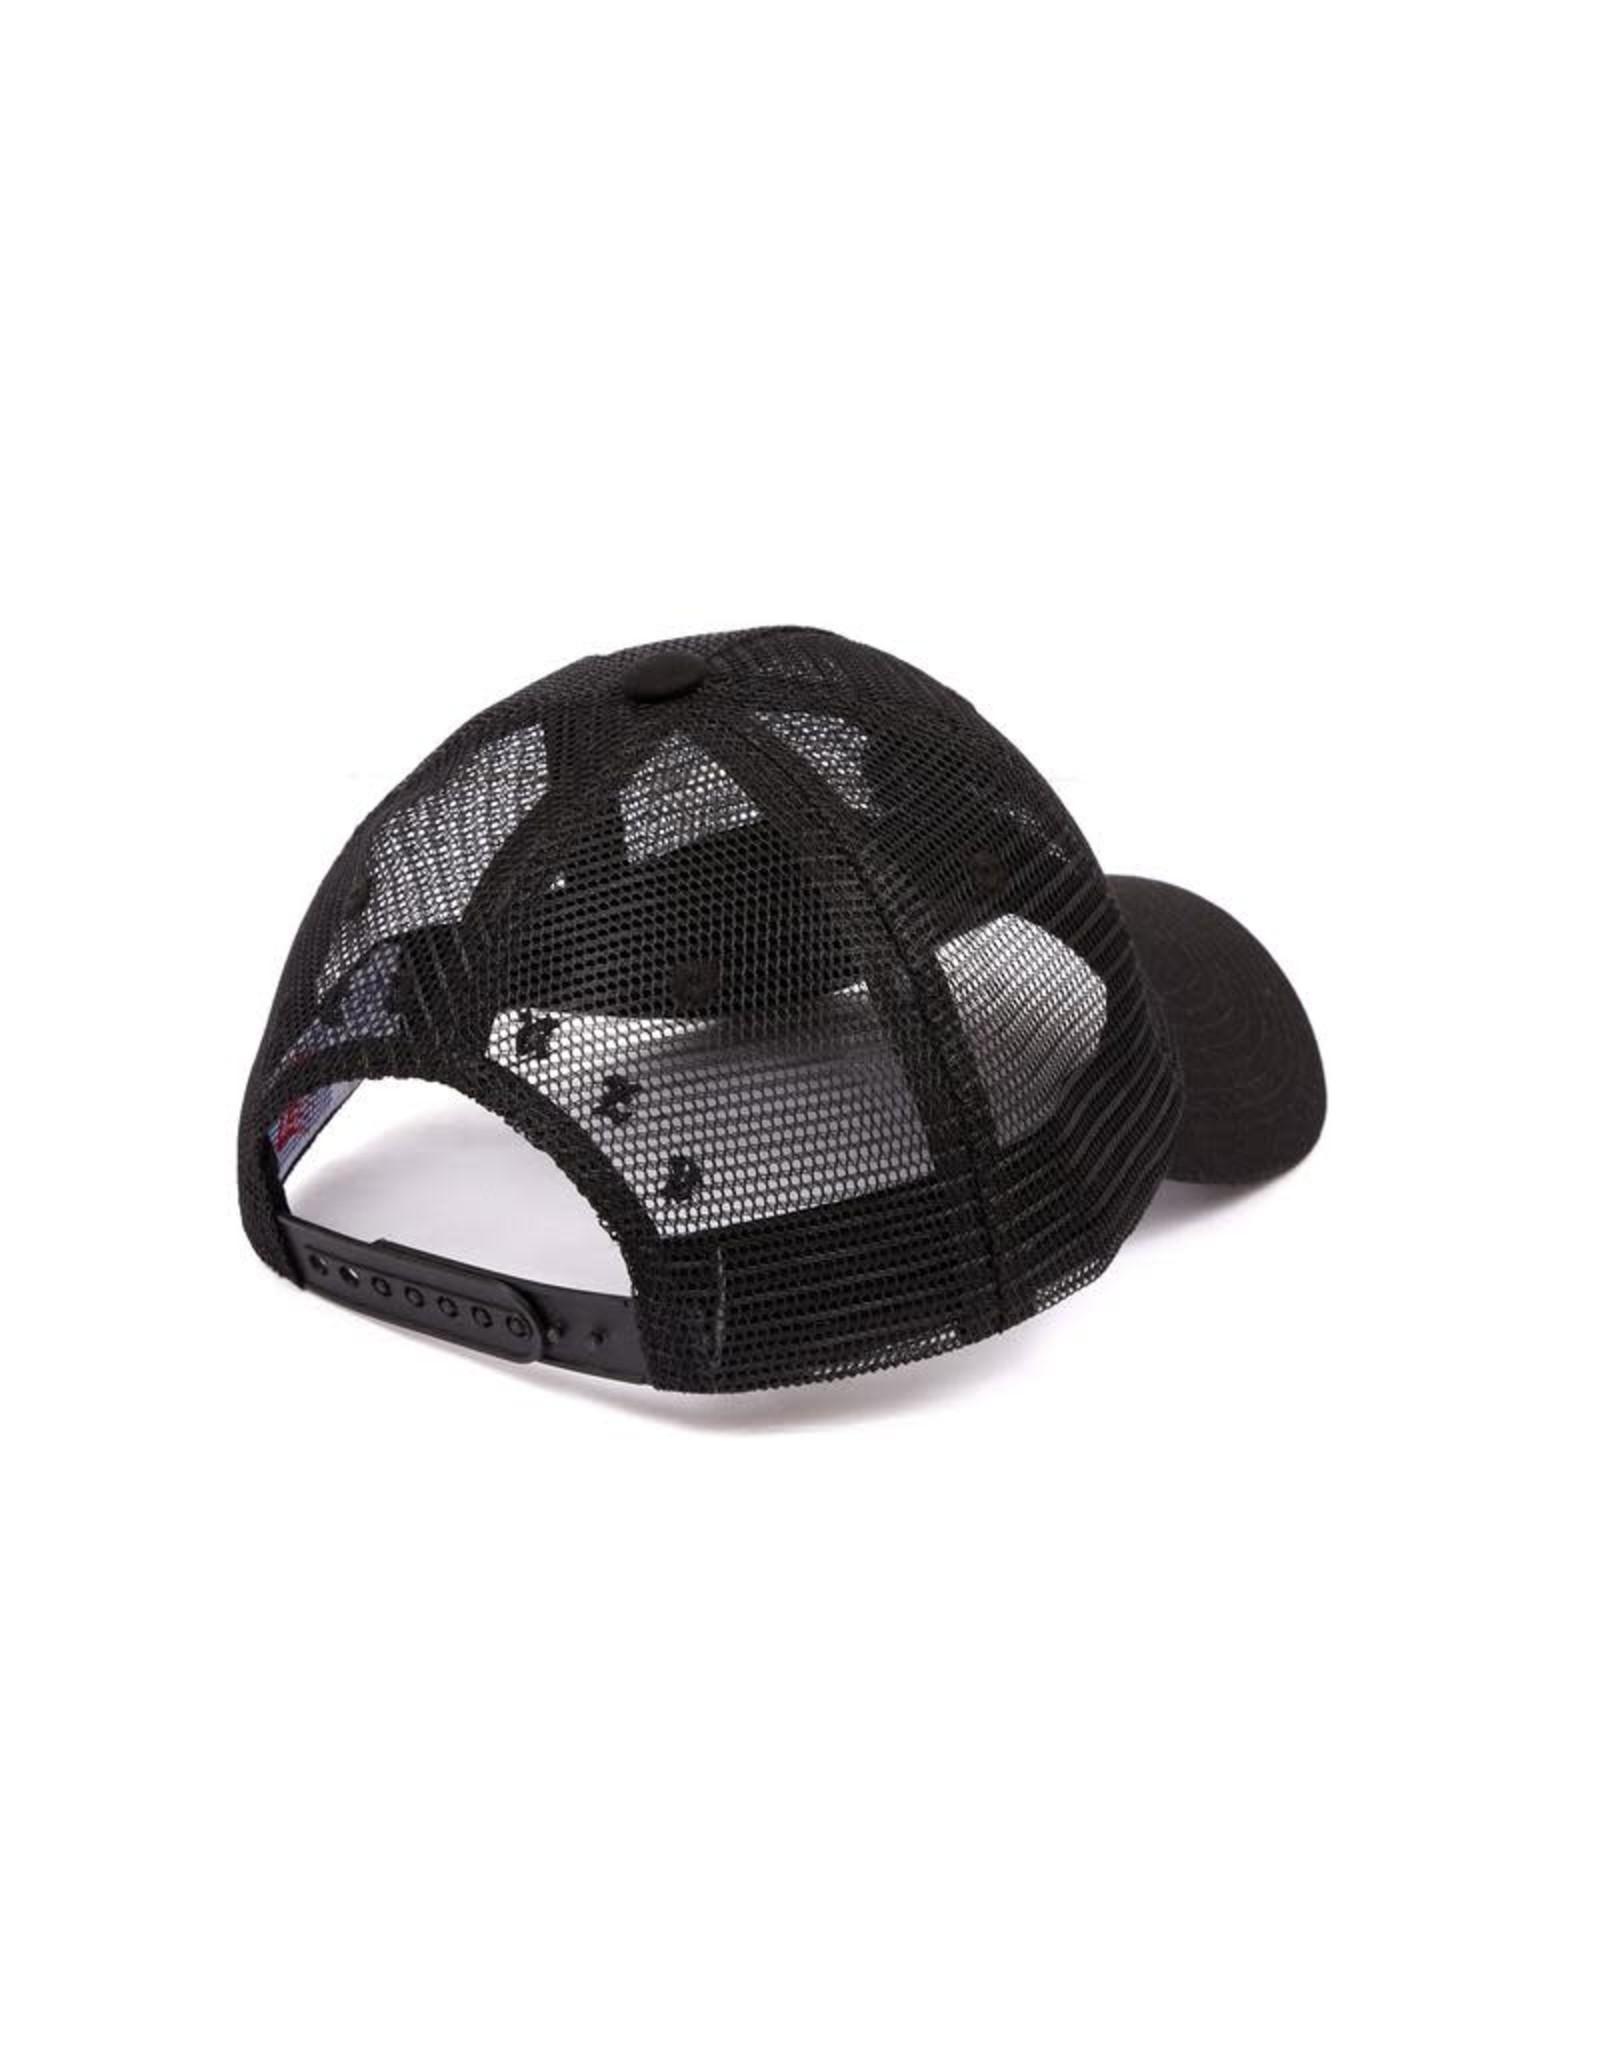 Bronze56K B Mesh Hat - Black